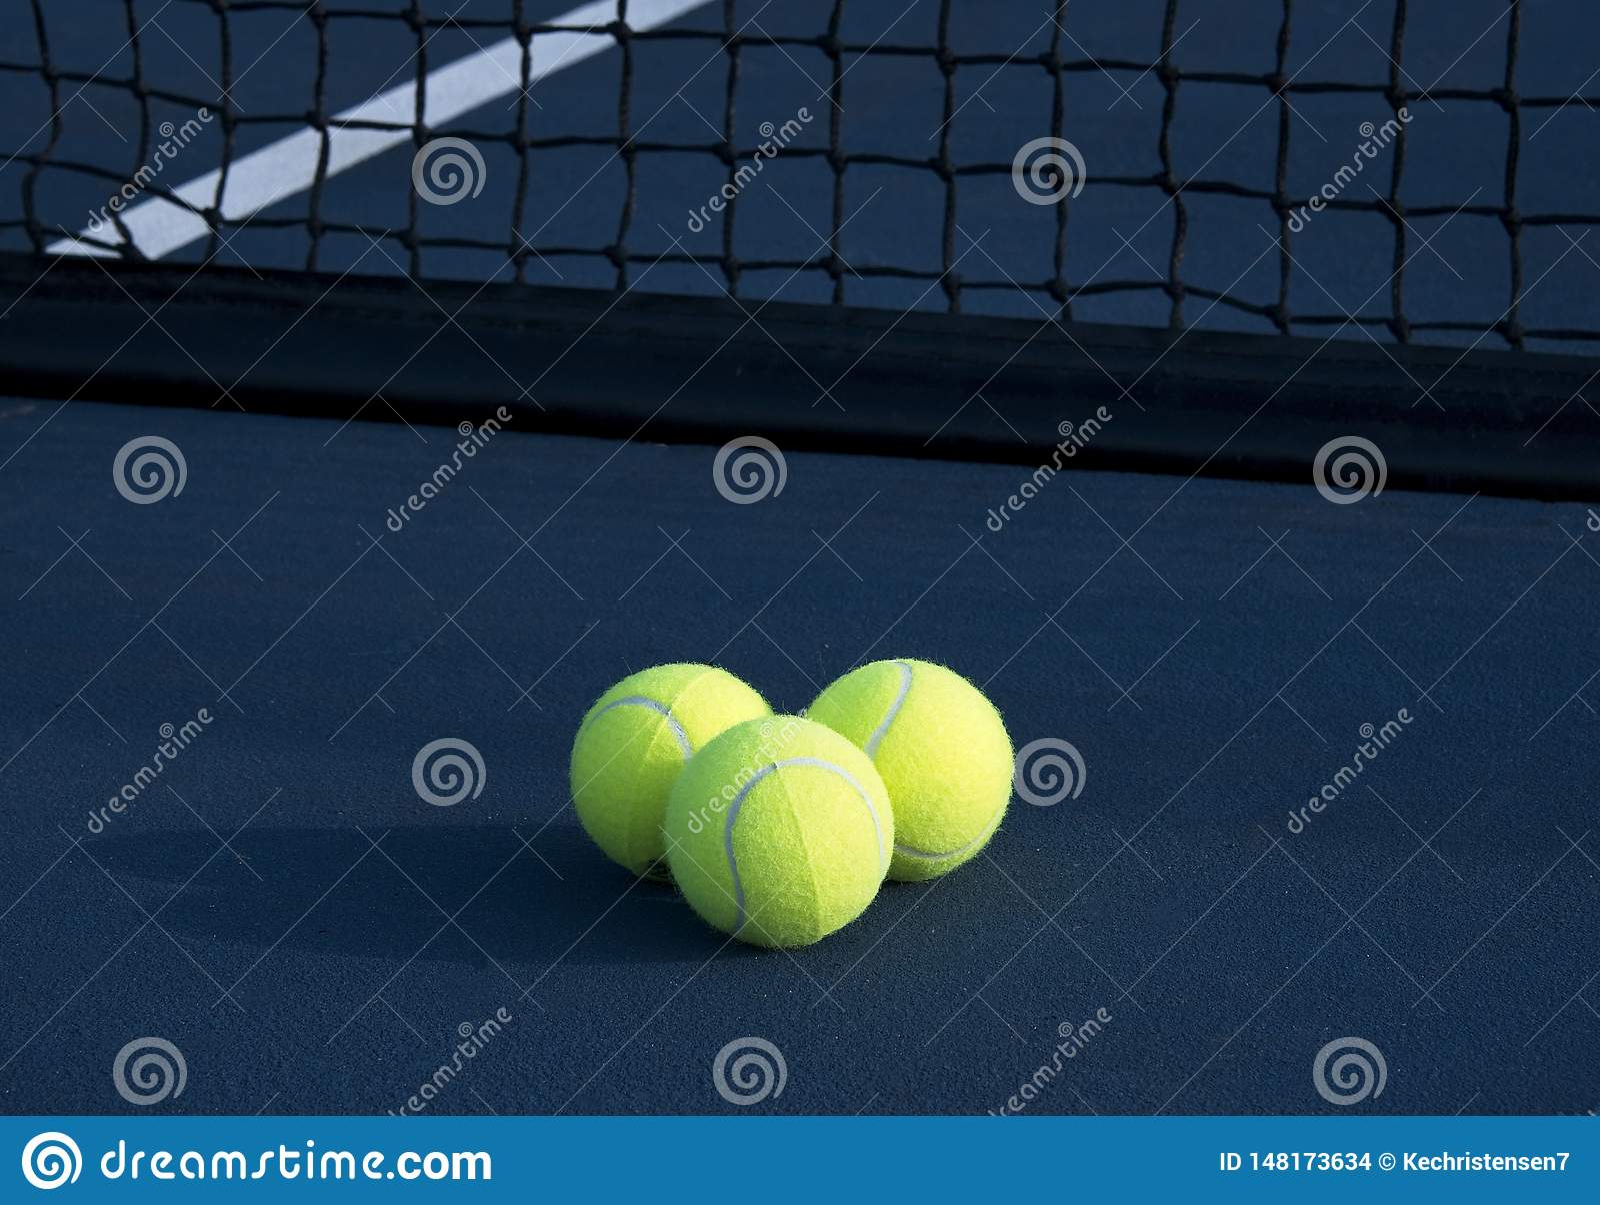 3 теннисного мяча на теннисном корте